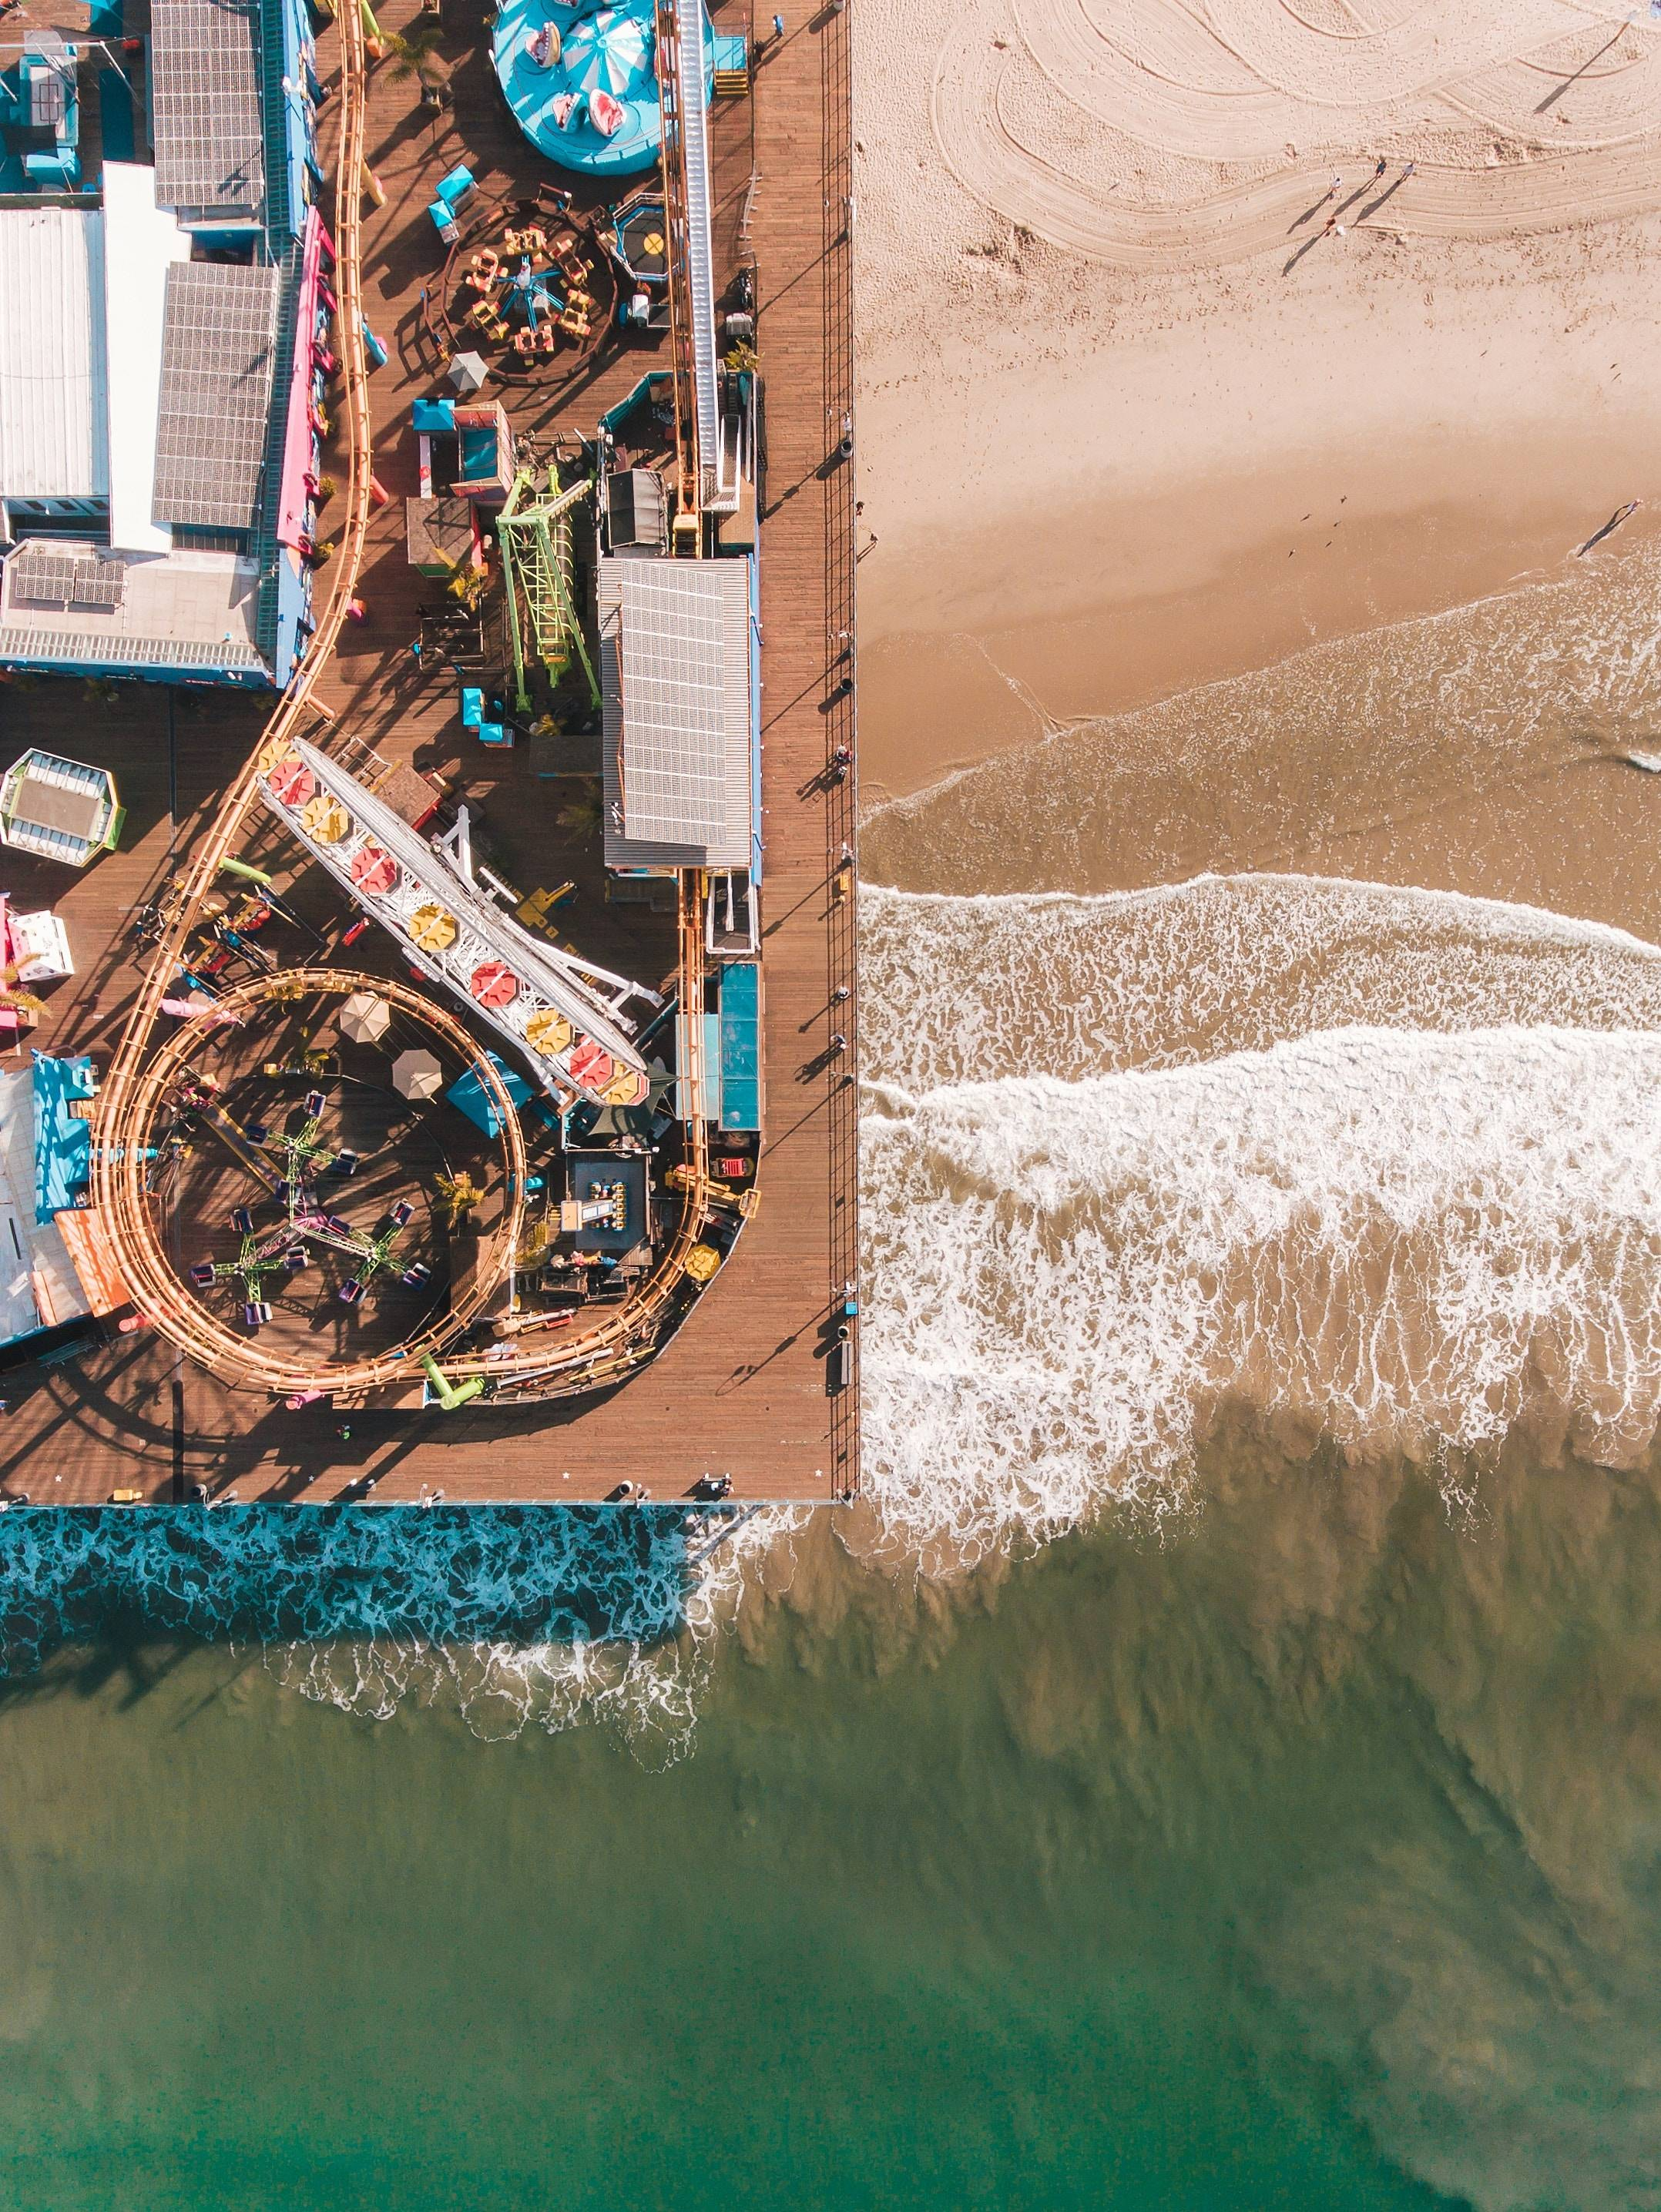 Aeries View of Santa Monica Pier